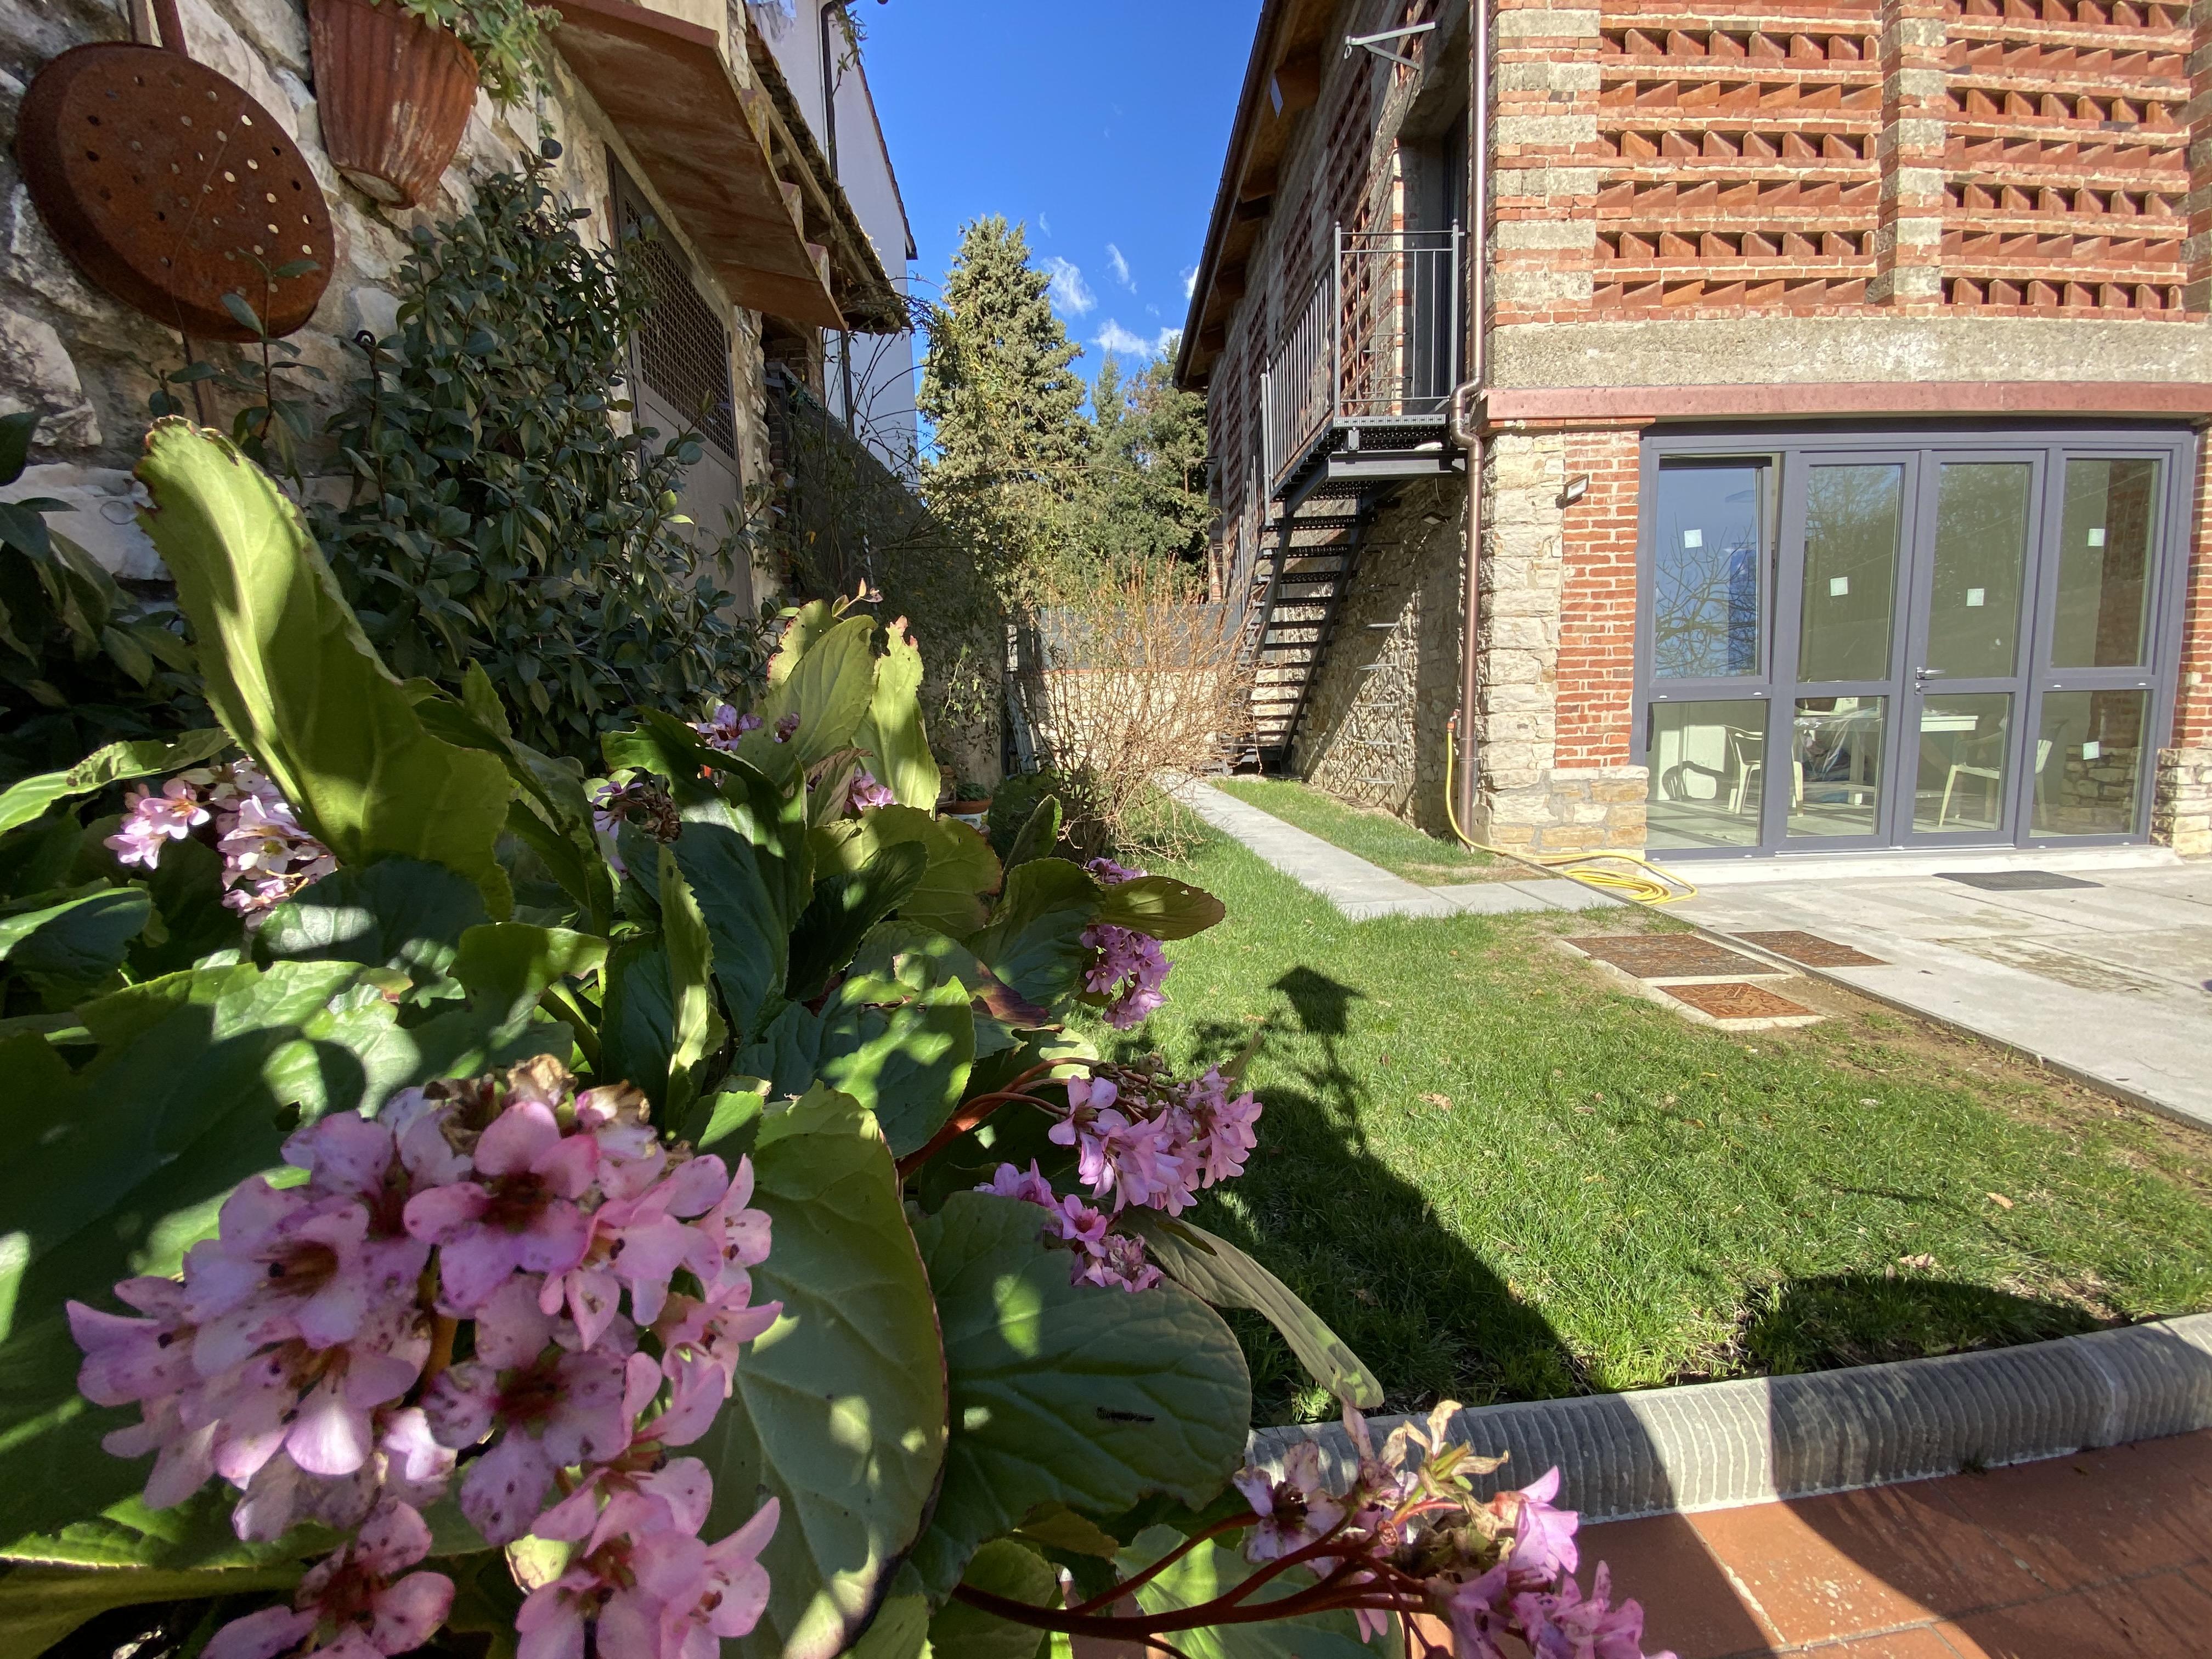 jardin en Toscane